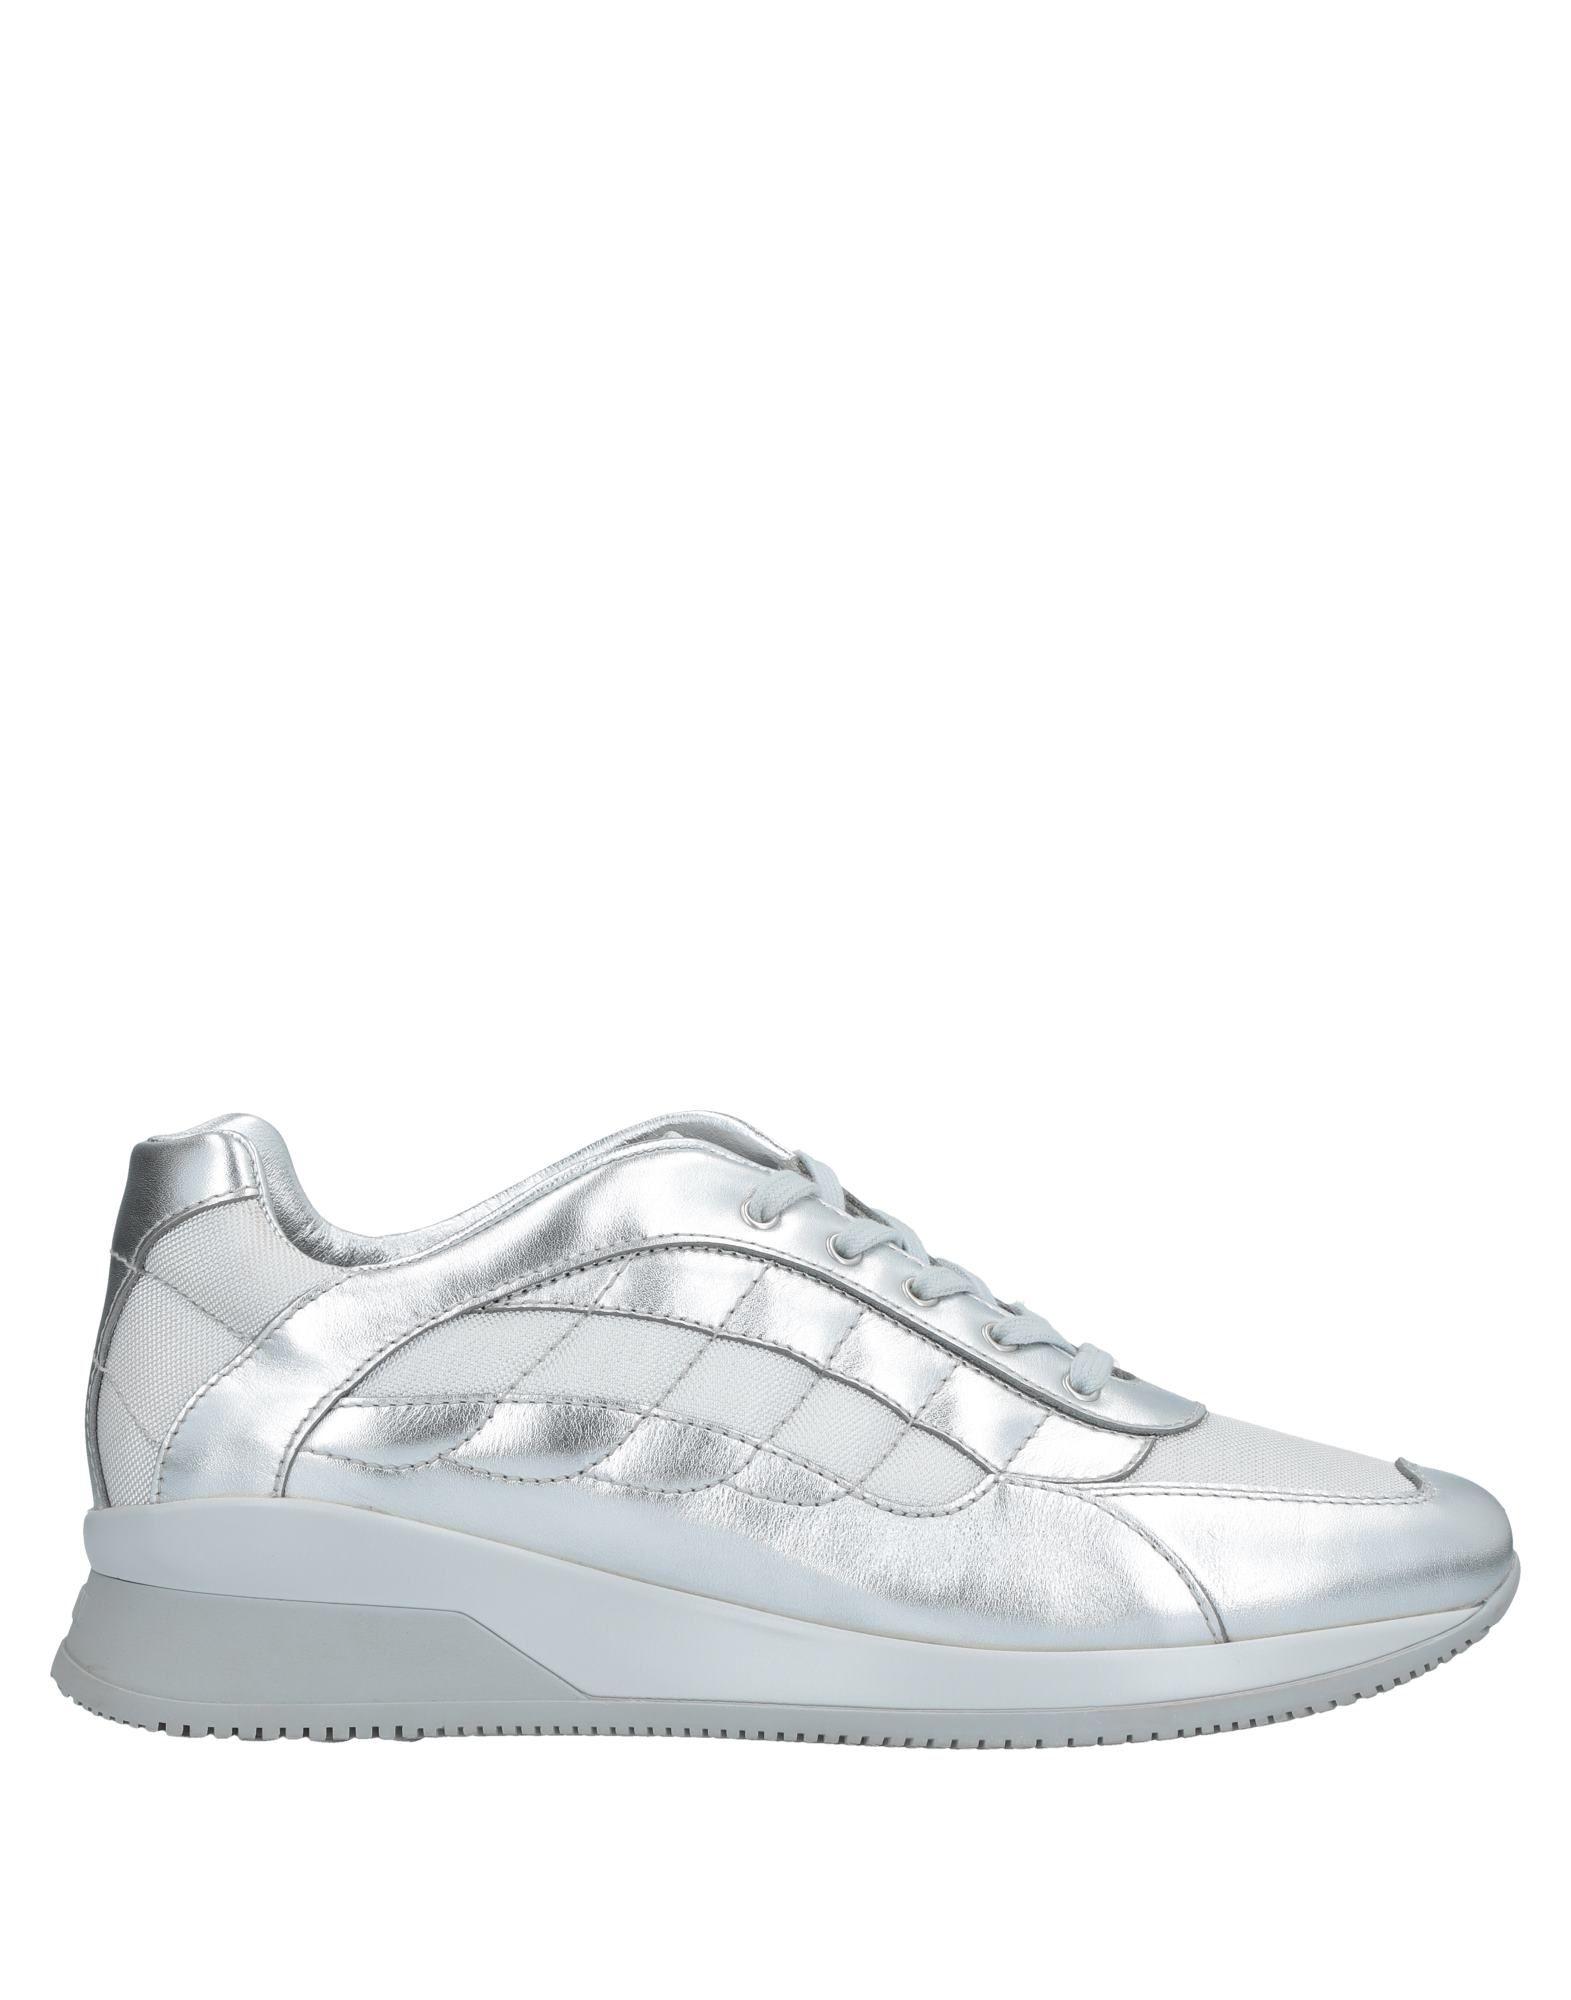 Sneakers Hogan By Karl Lagerfeld Donna - 11533724JU